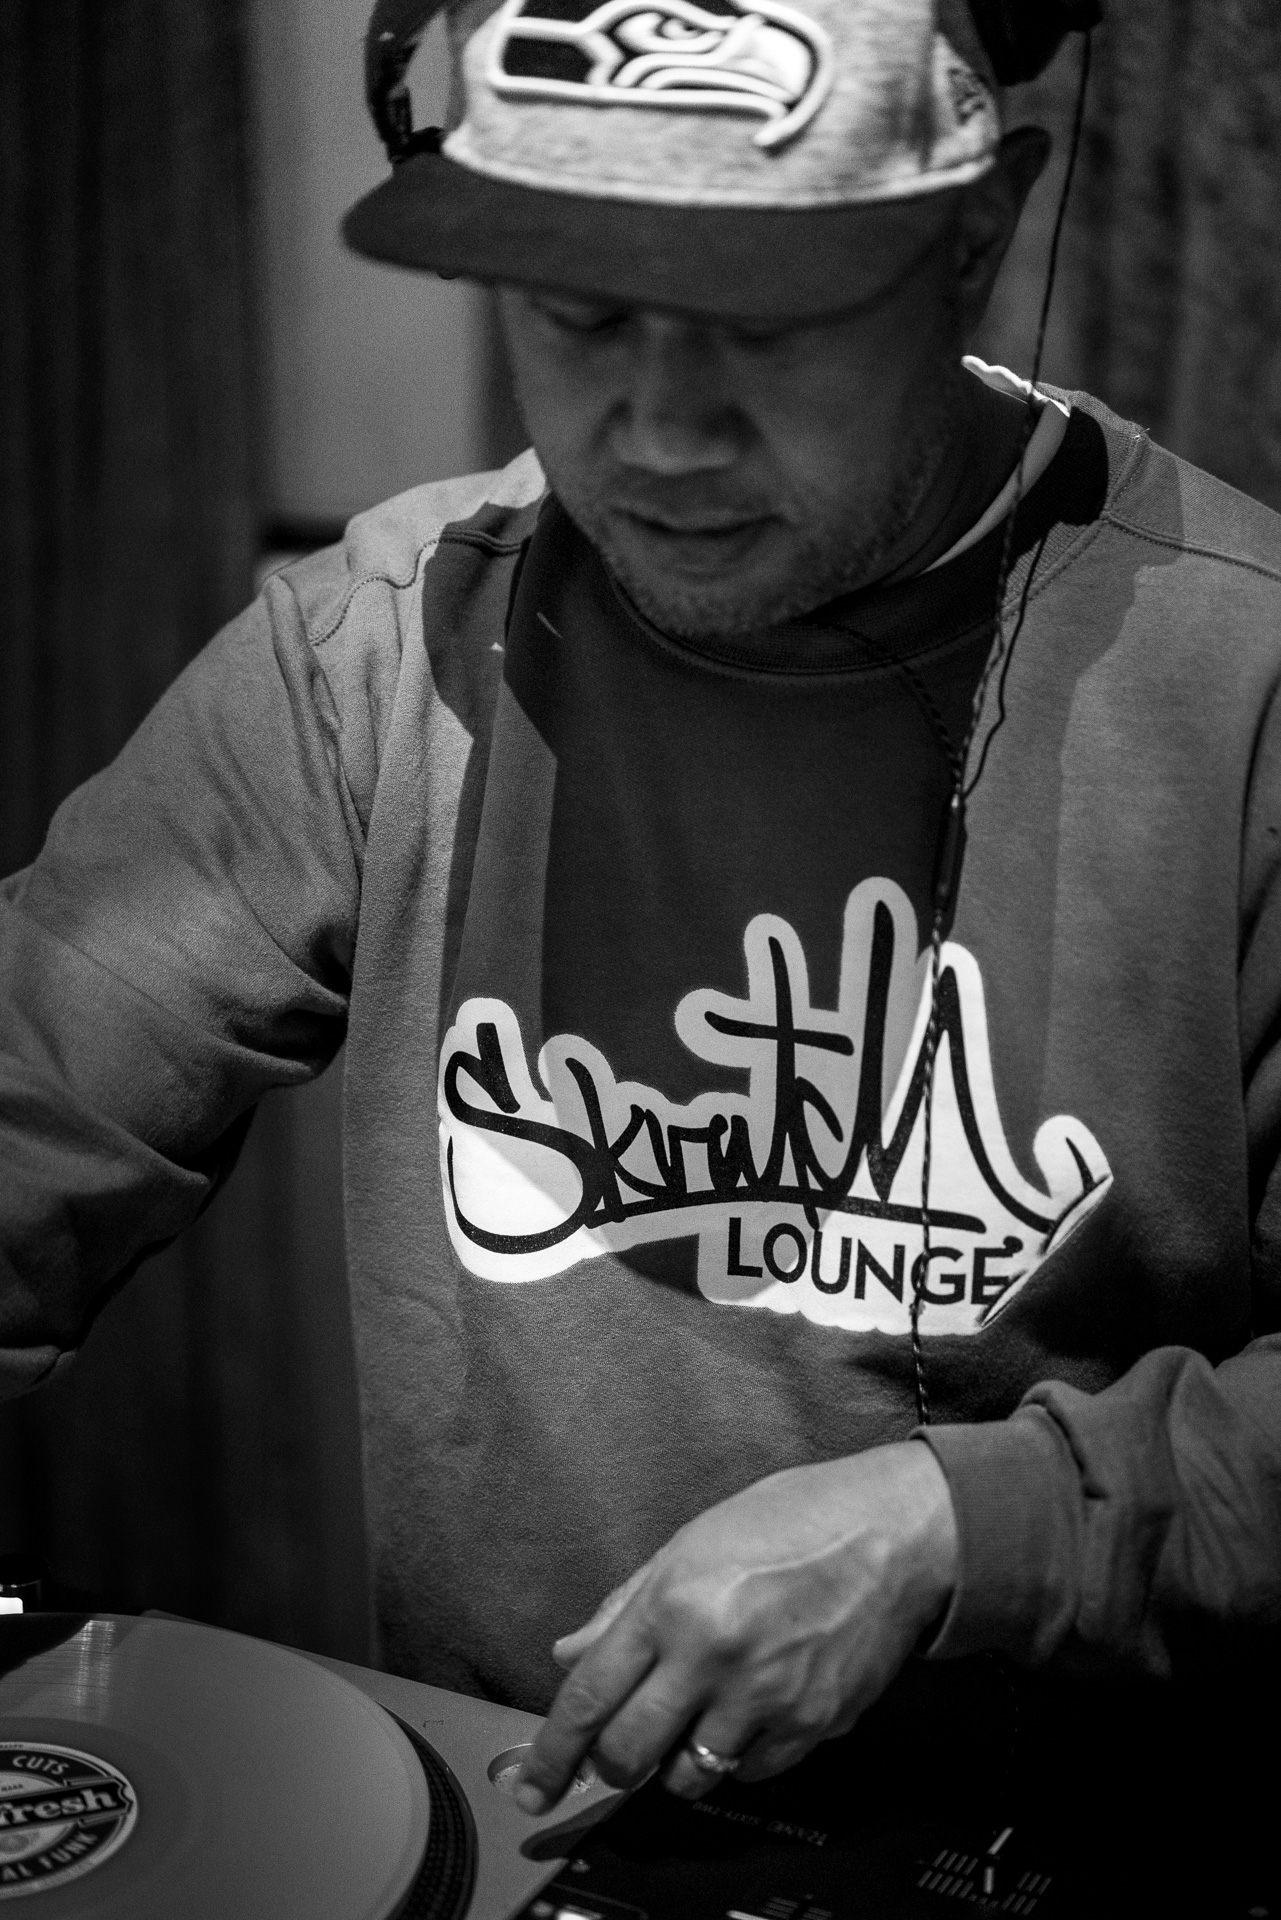 2016_11_03_Skratch Lounge_0040_Export.jpg